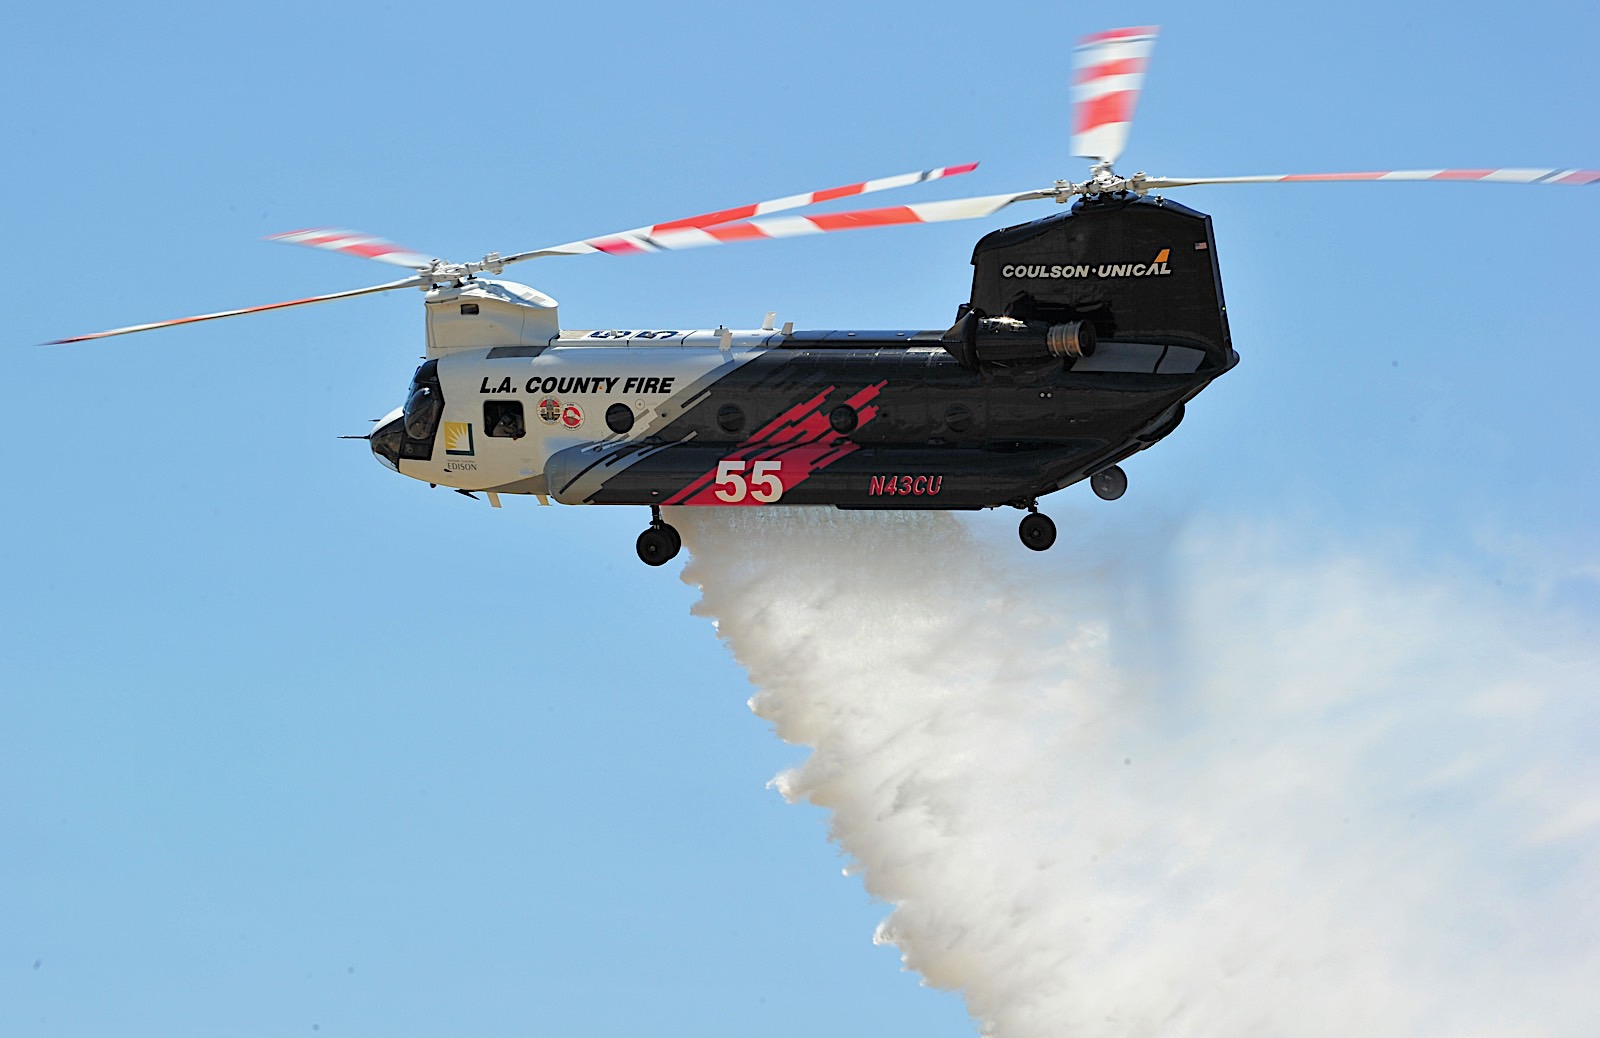 Coulson CH-47